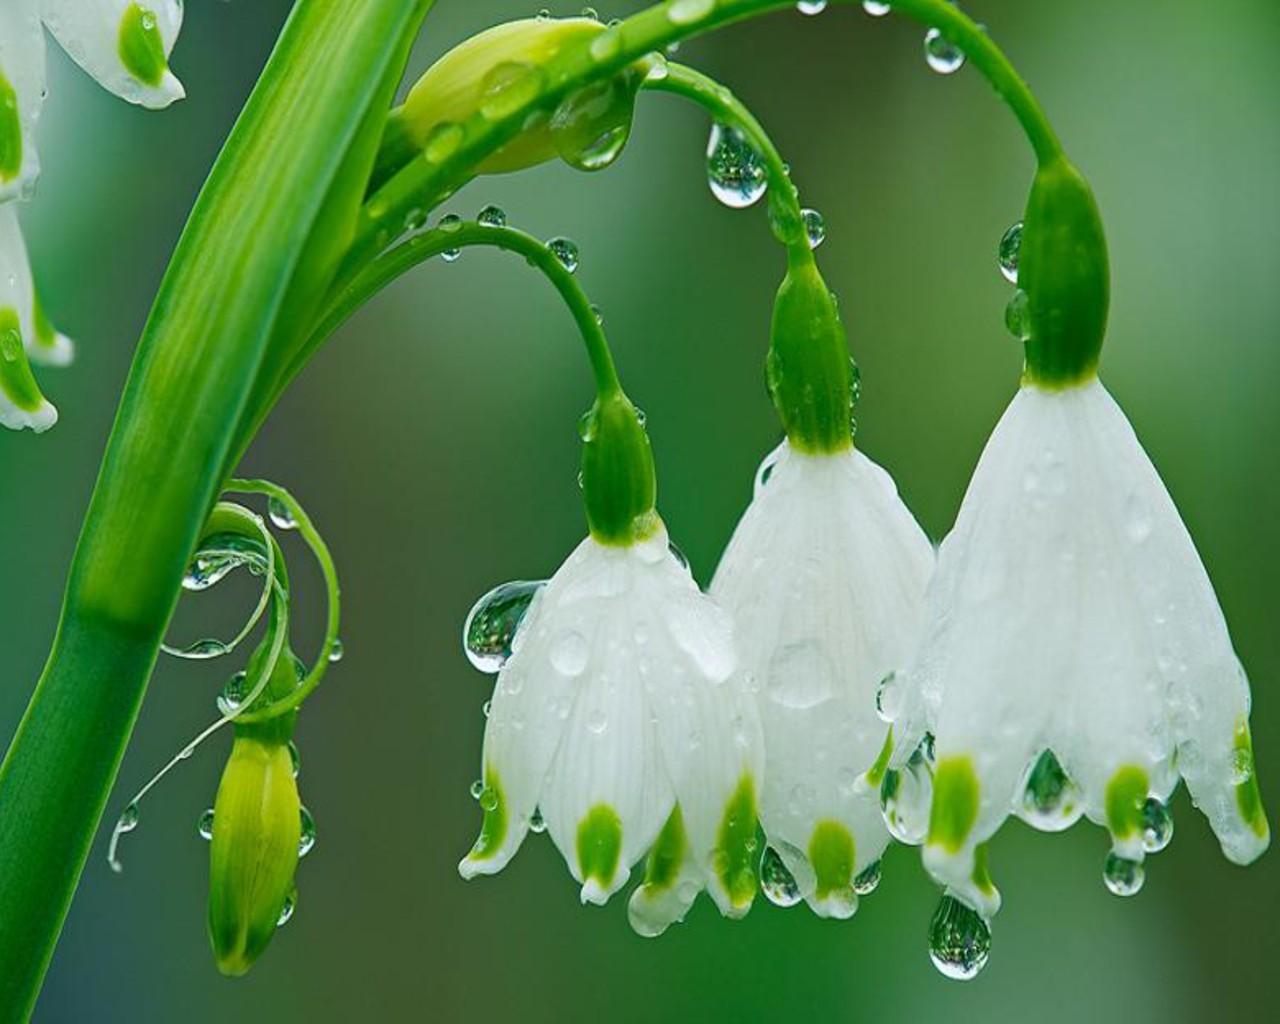 Rain Flowers Wallpaper 1280x1024 Rain Flowers Garden Spring 1280x1024